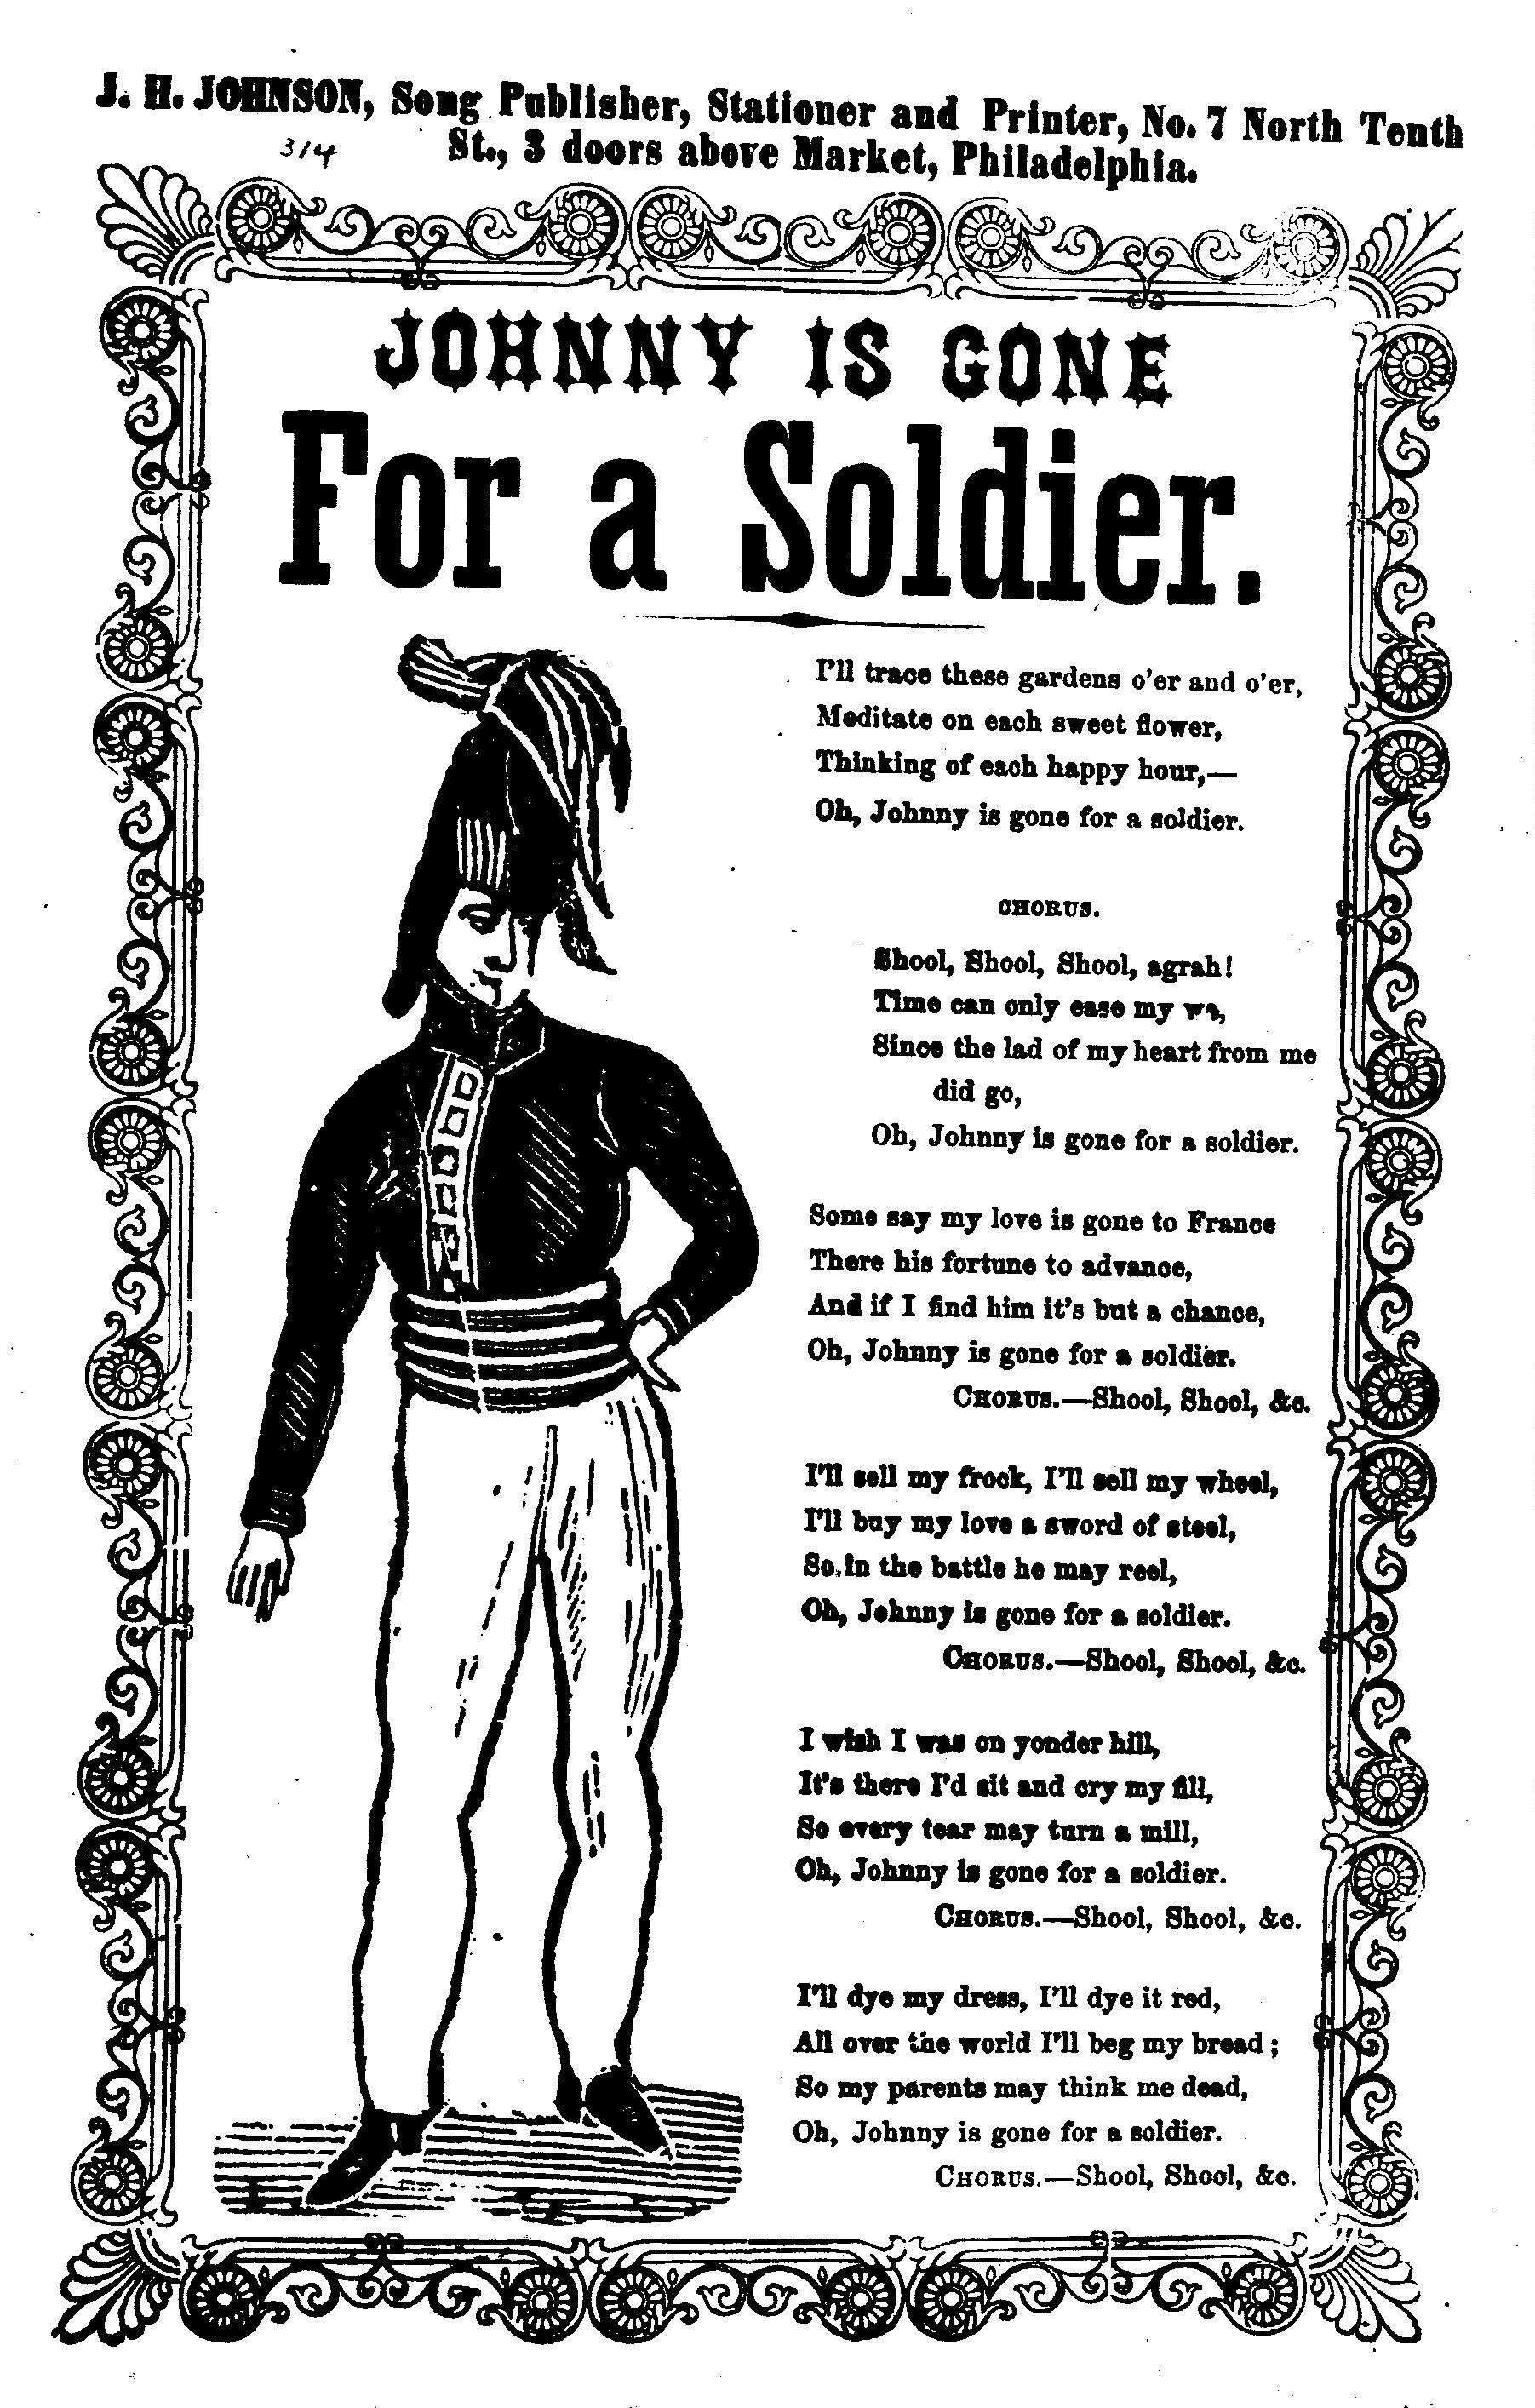 soldier of fortune lyrics